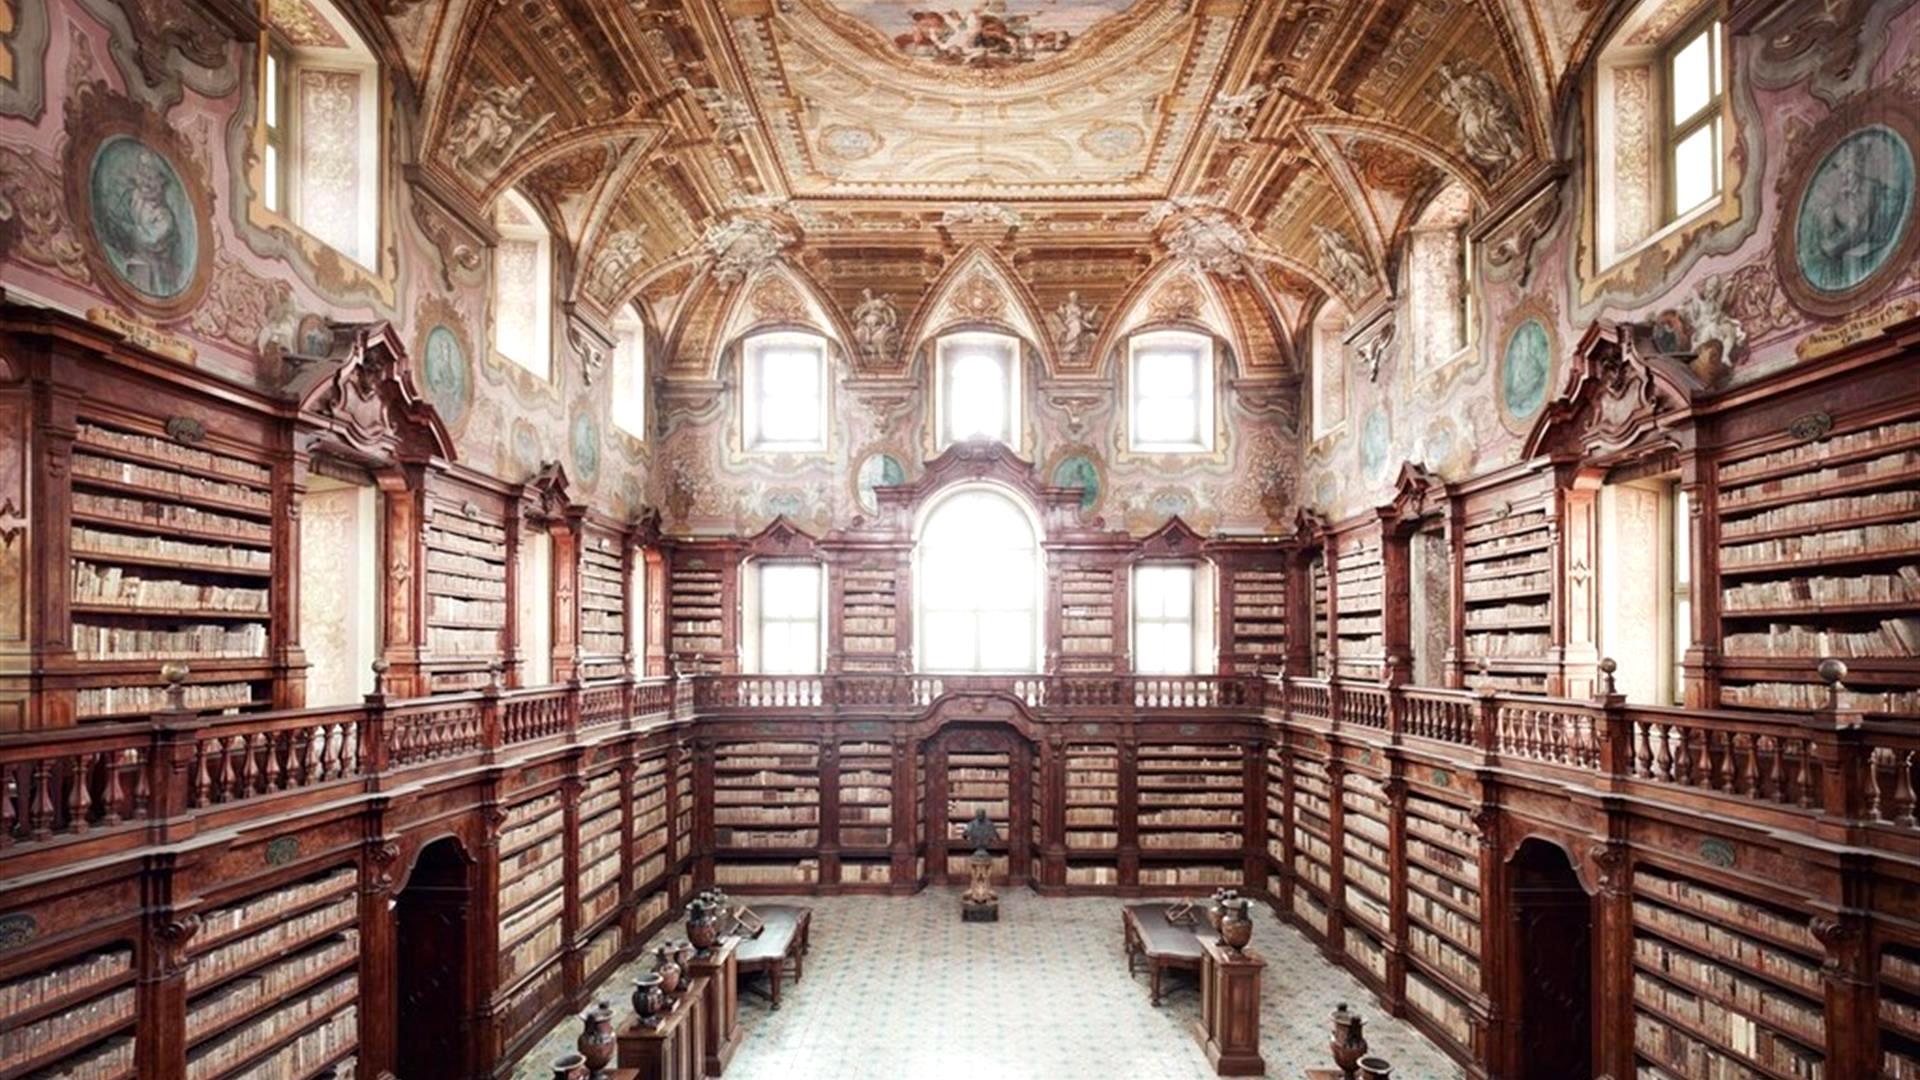 One of most beautiful libraries in the world, the Biblioteca Oratoriana dei Girolamini, Naples